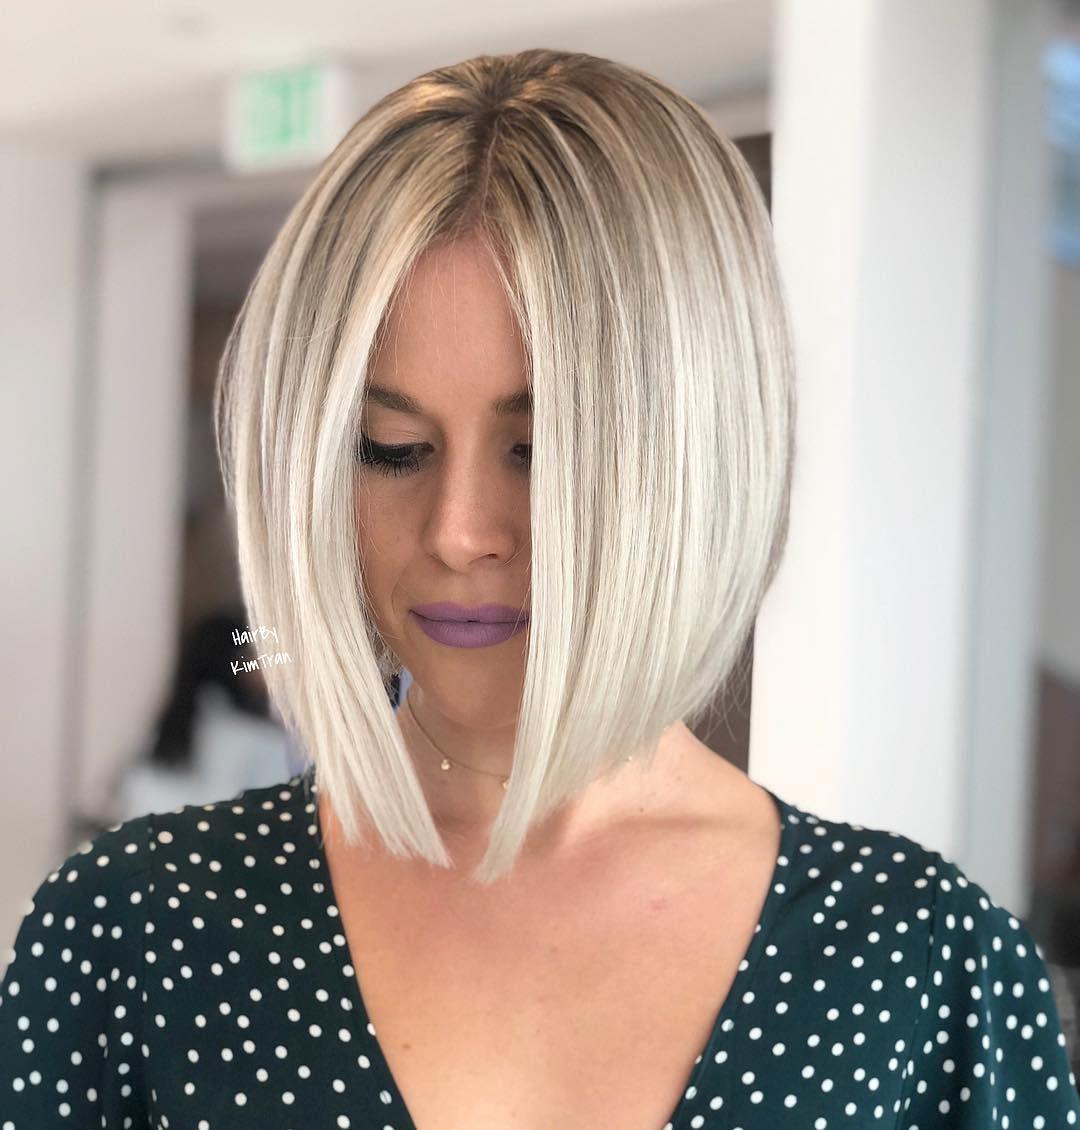 Kimberley Wyatt Medium, Tousled Hairstyles for Blonde Hair 2013